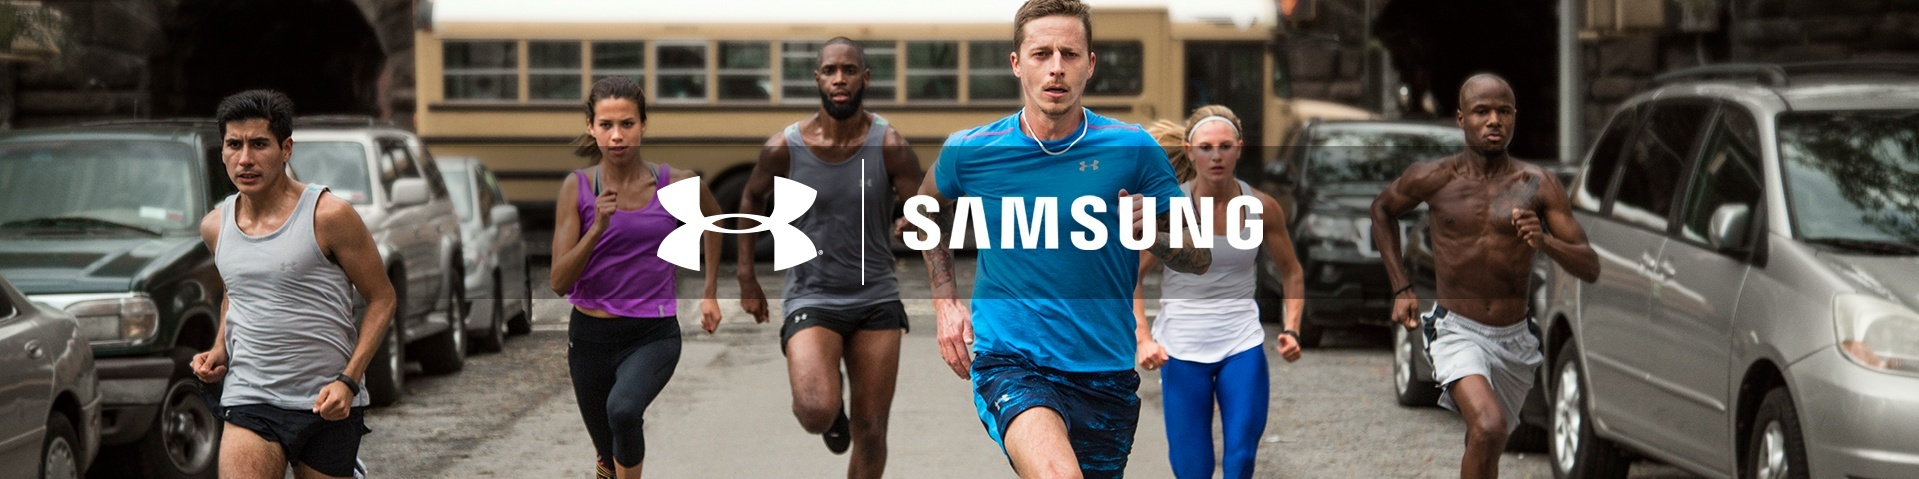 Under Armour - Samsung Gear Apps